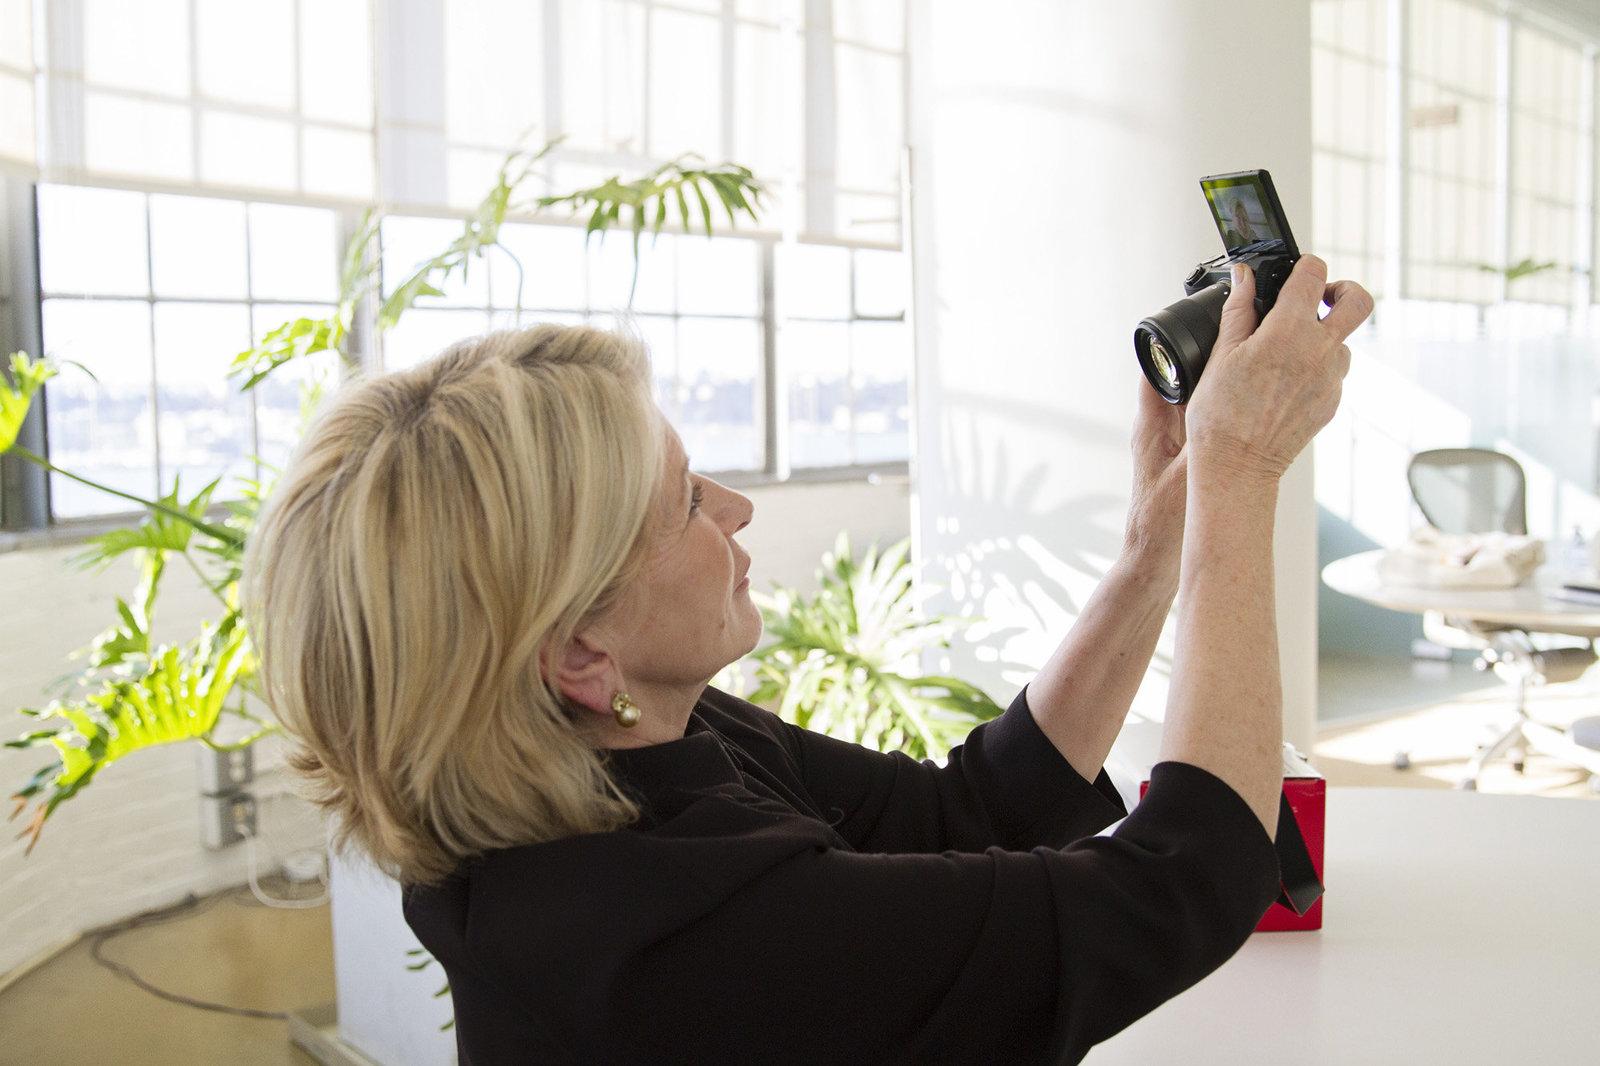 Martha Stewart Taking a Selfie